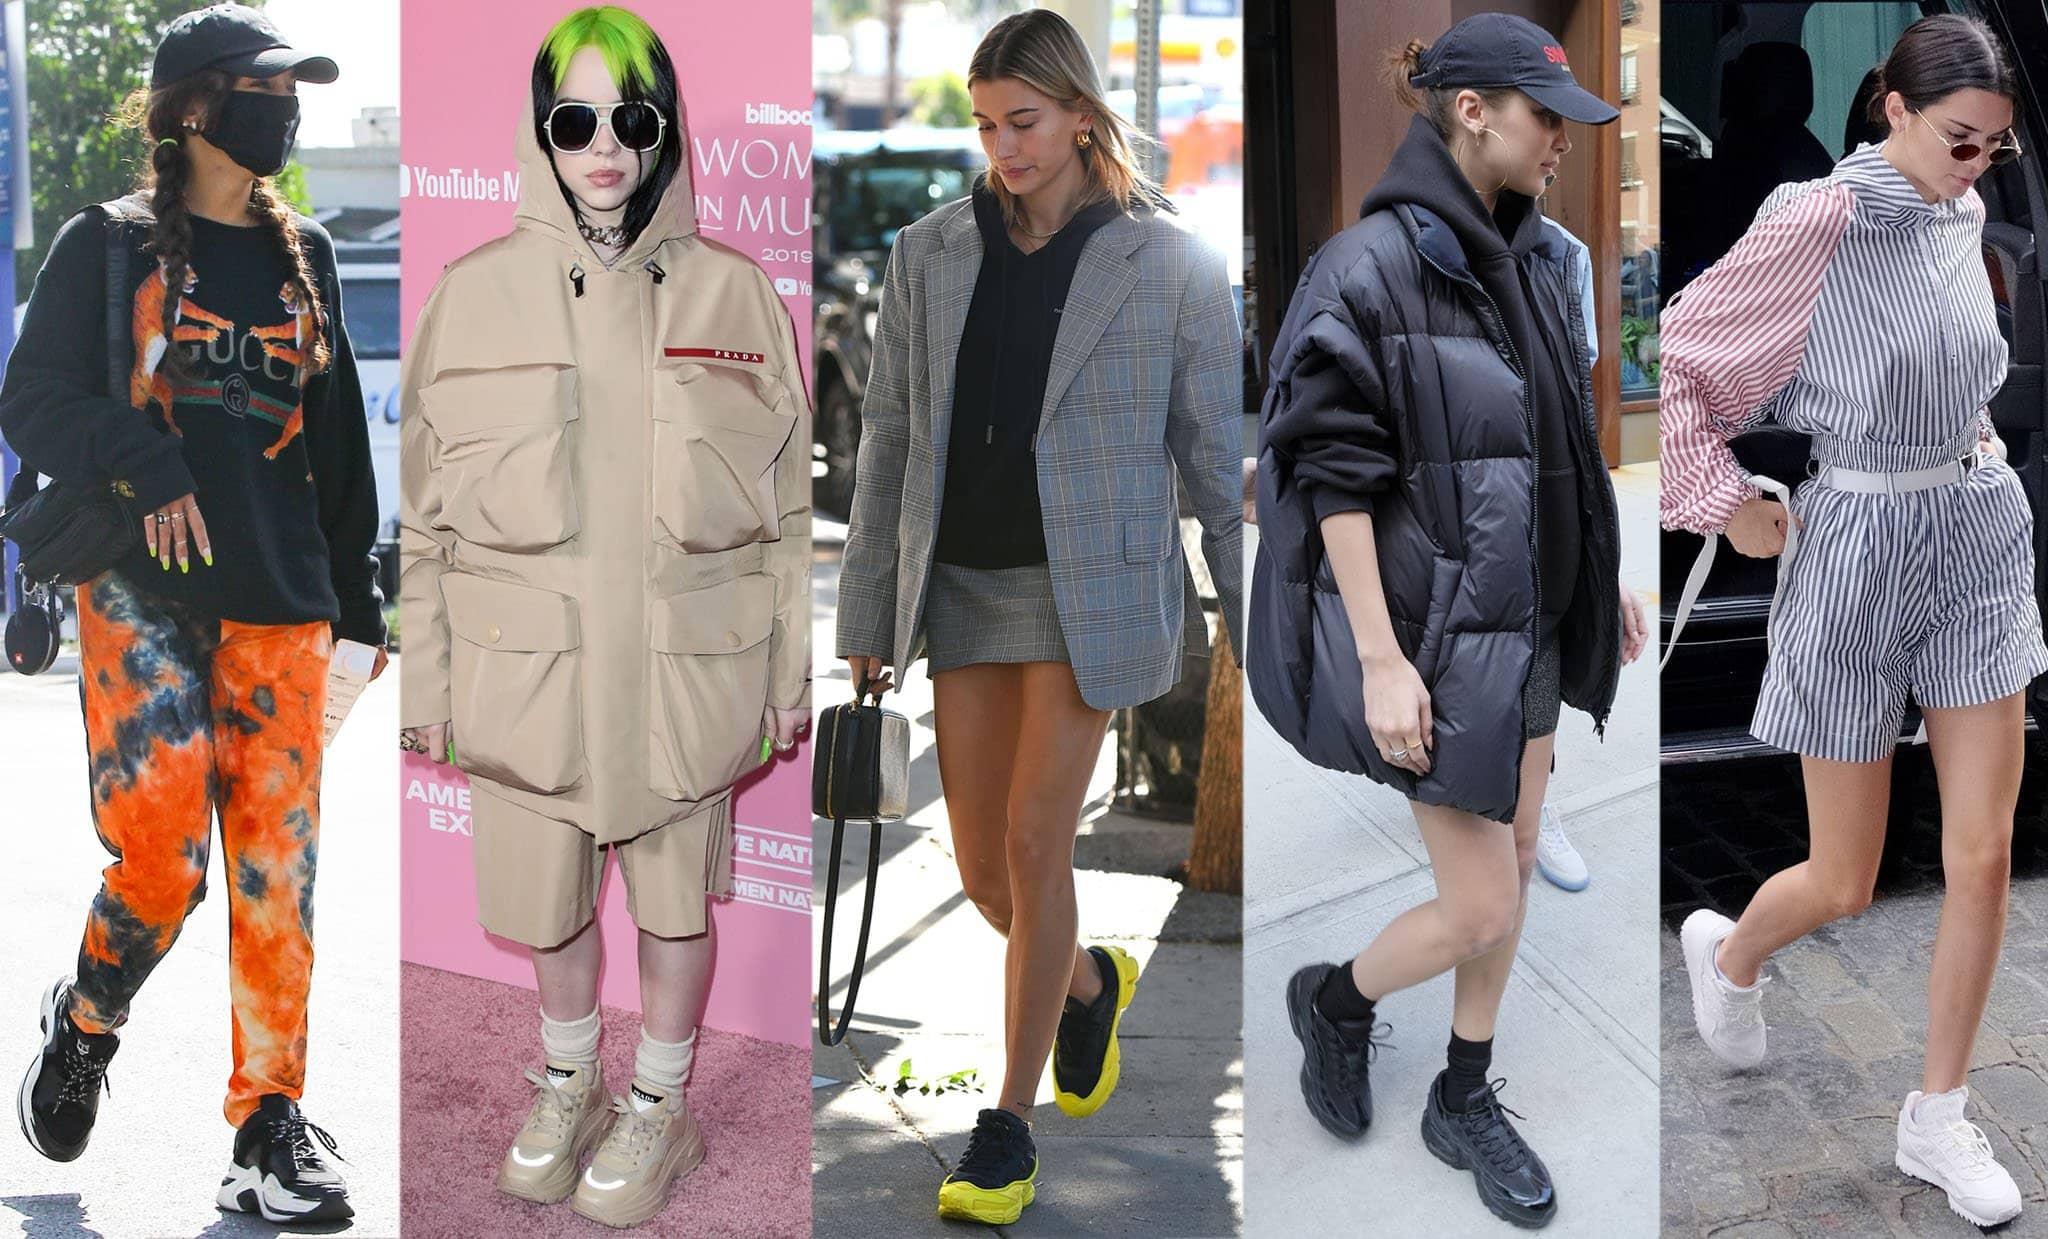 Vanessa Hudgens, Billie Eilish, Hailey Bieber, Bella Hadid, and Kendall Jenner wearing chunky sneakers